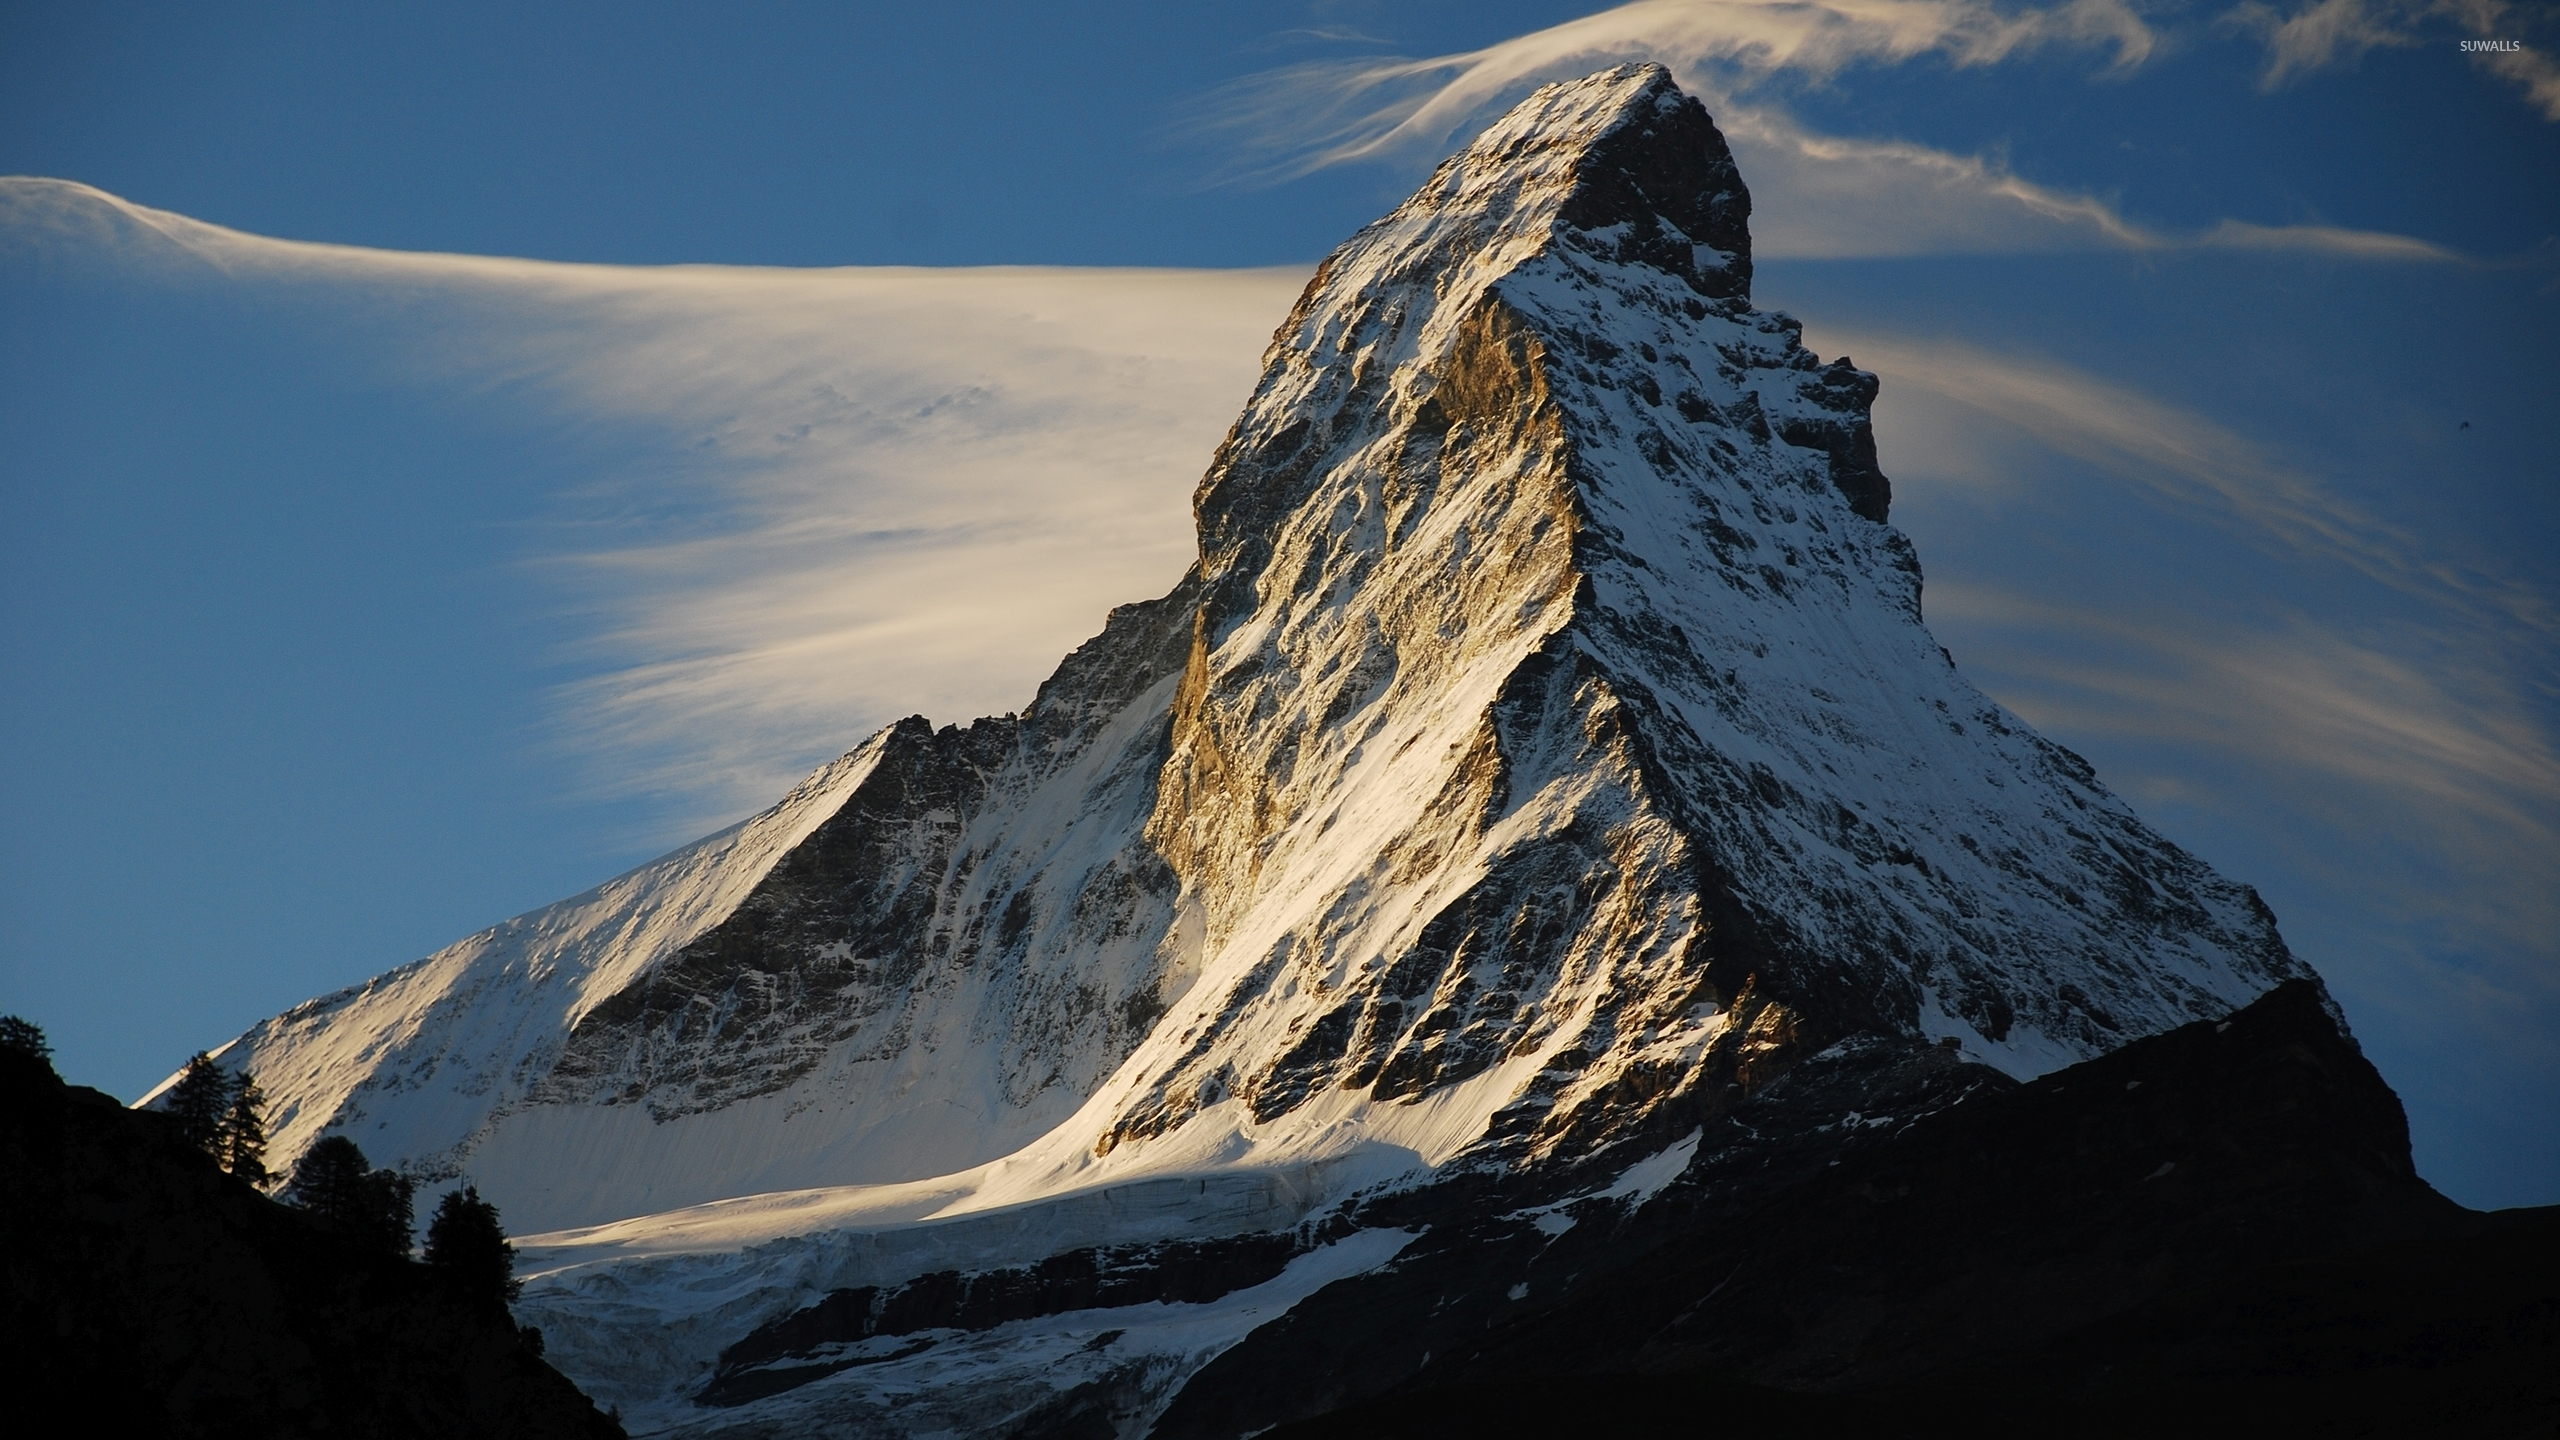 Typography Quotes Wallpaper Matterhorn 3 Wallpaper Nature Wallpapers 42895